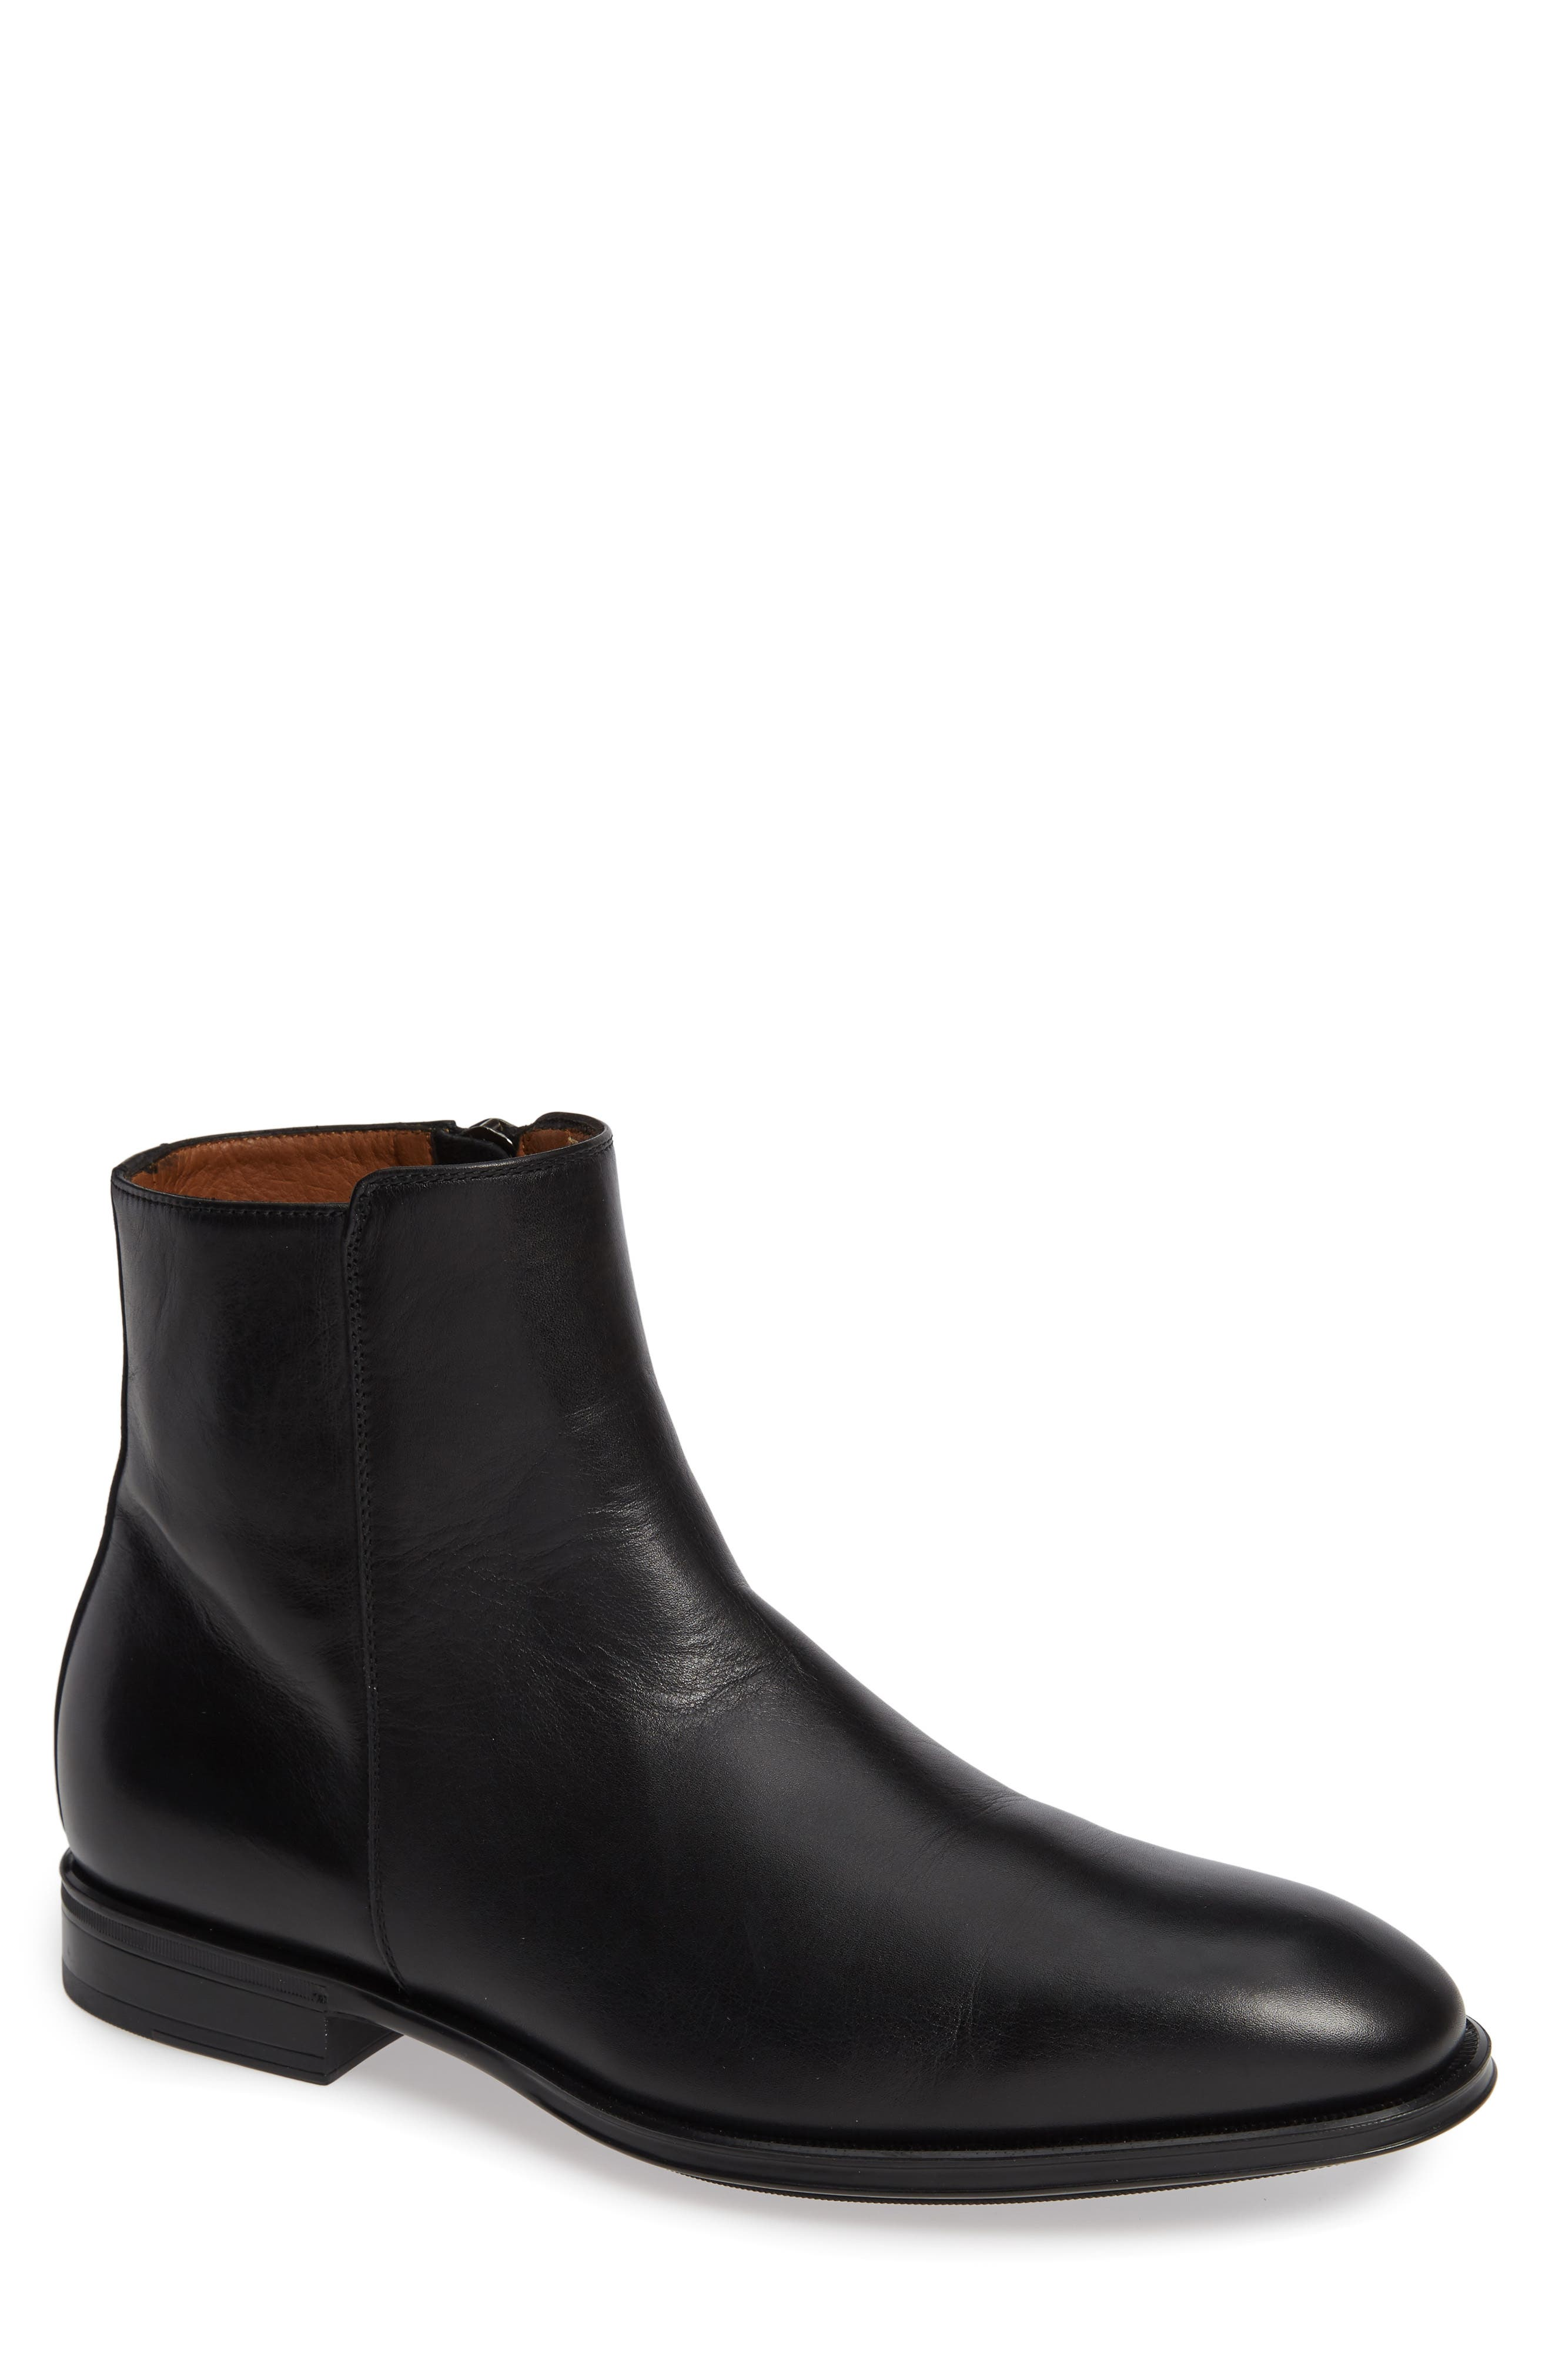 Aquatalia Daniel Water Resistant Zip Boot, Black